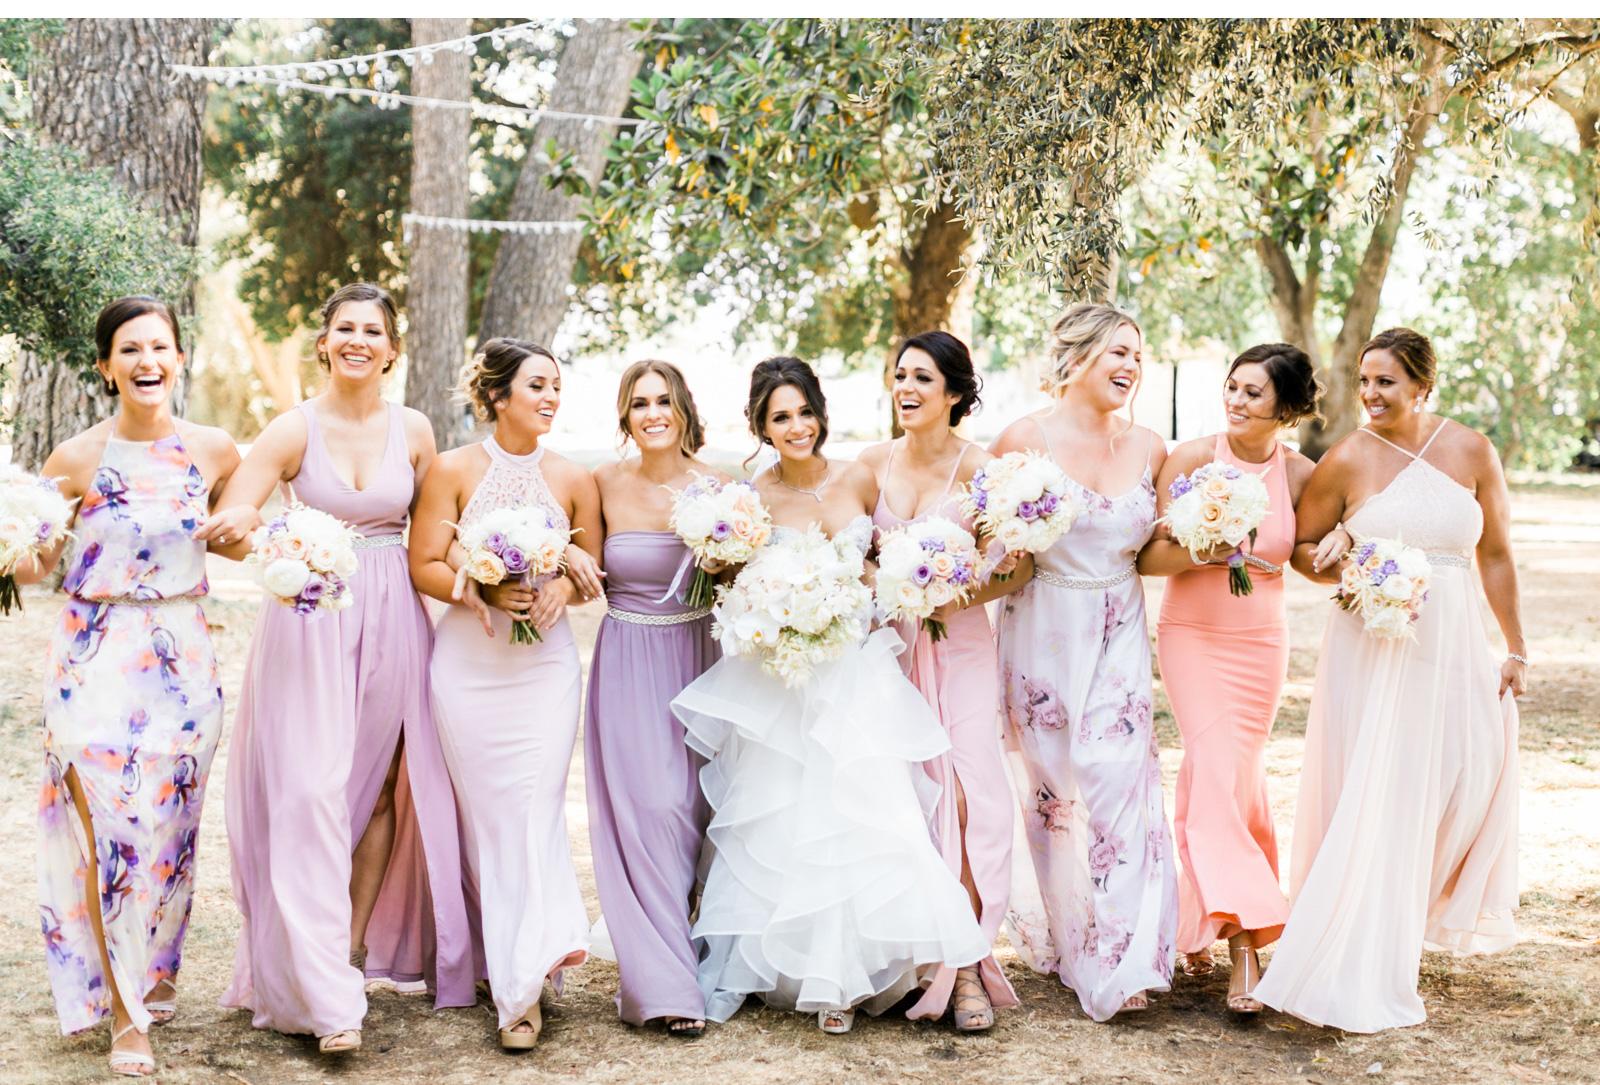 Lavender-field-style-me-pretty-wedding-natalie-schutt-photography_02.jpg